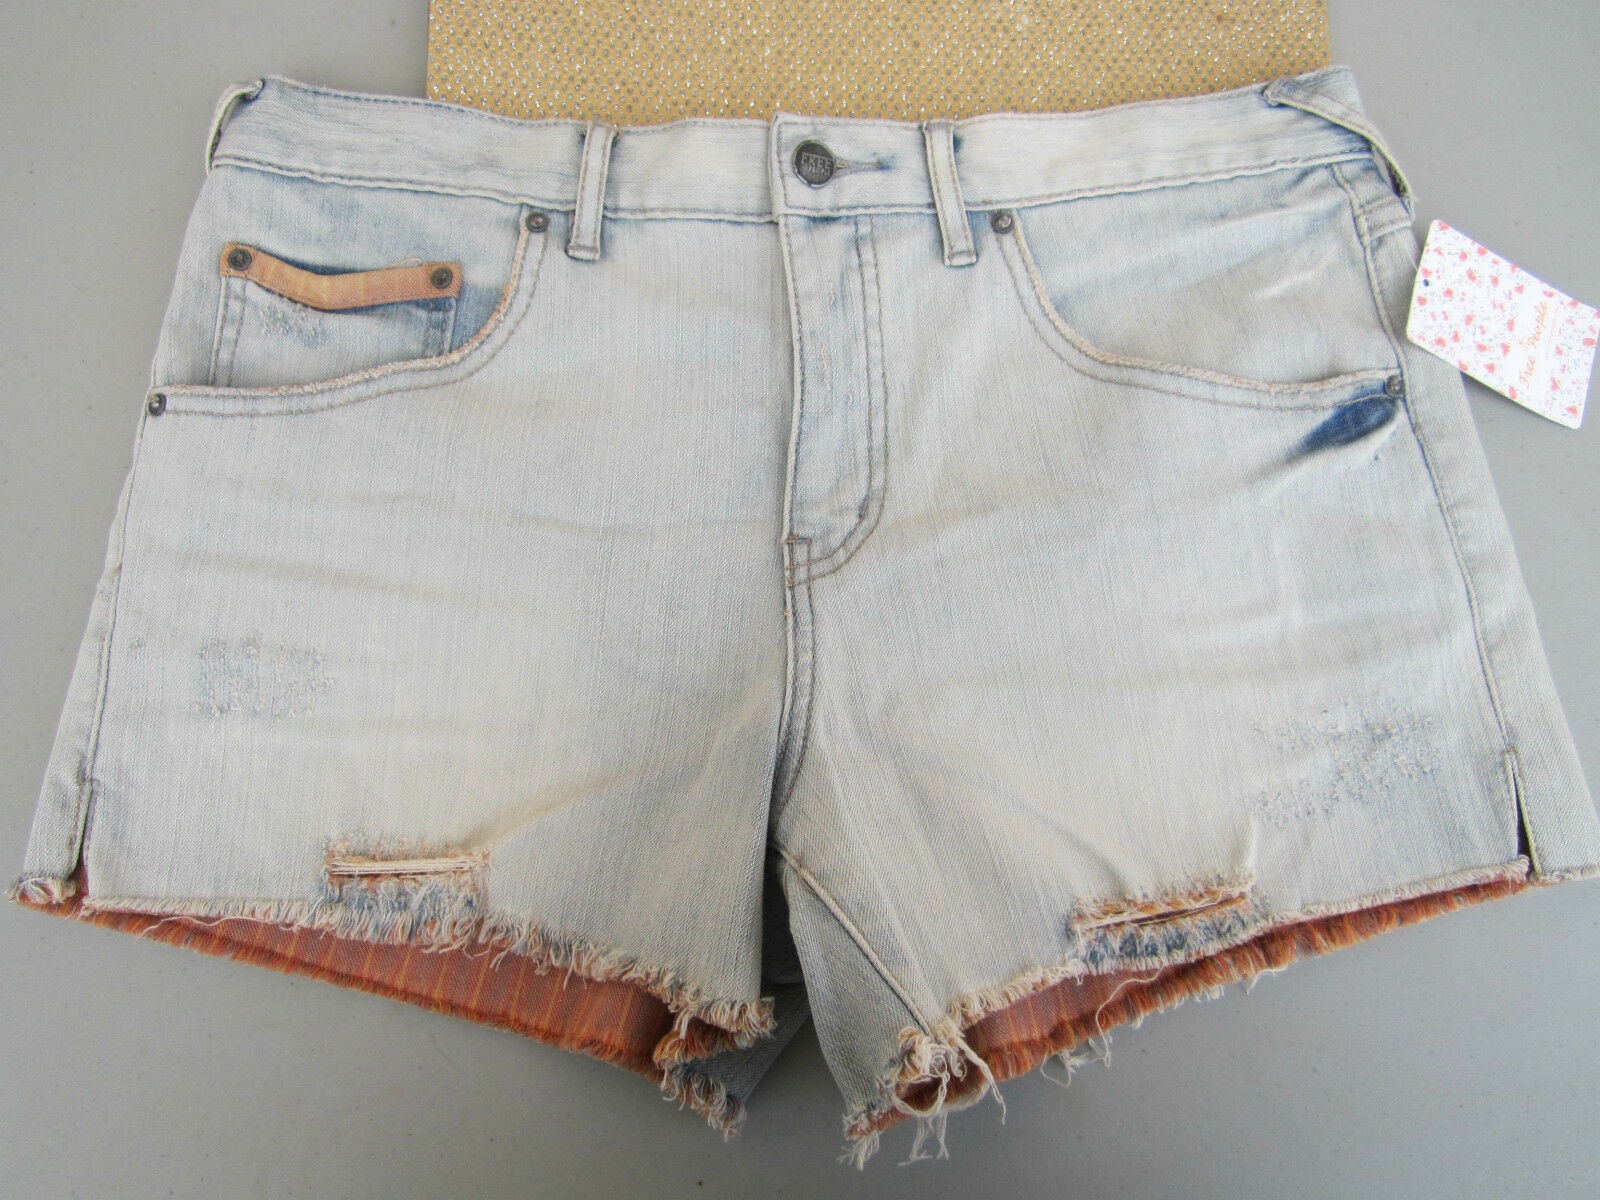 NWT Free People LADIES 30 JEAN DENIM Shorts PANTS Distressed Cut Offs Warner blue